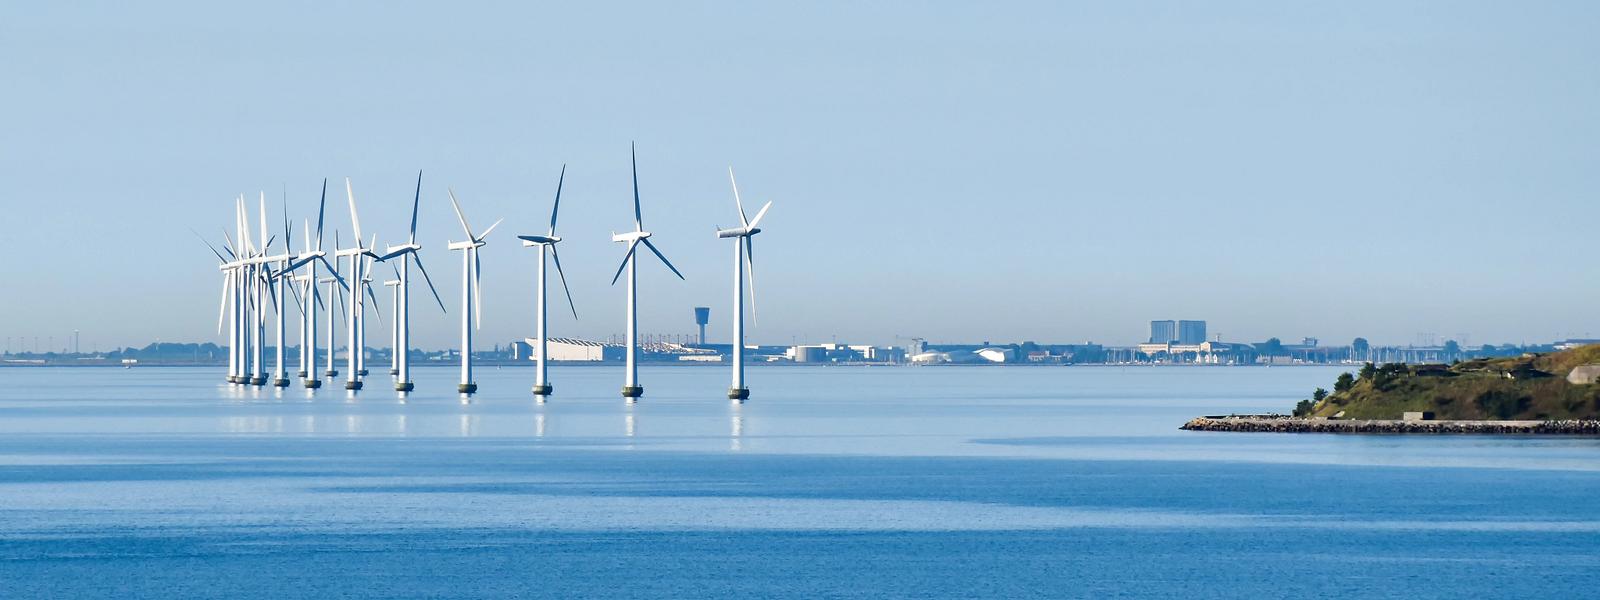 Offshore windmill farm Copenhagen